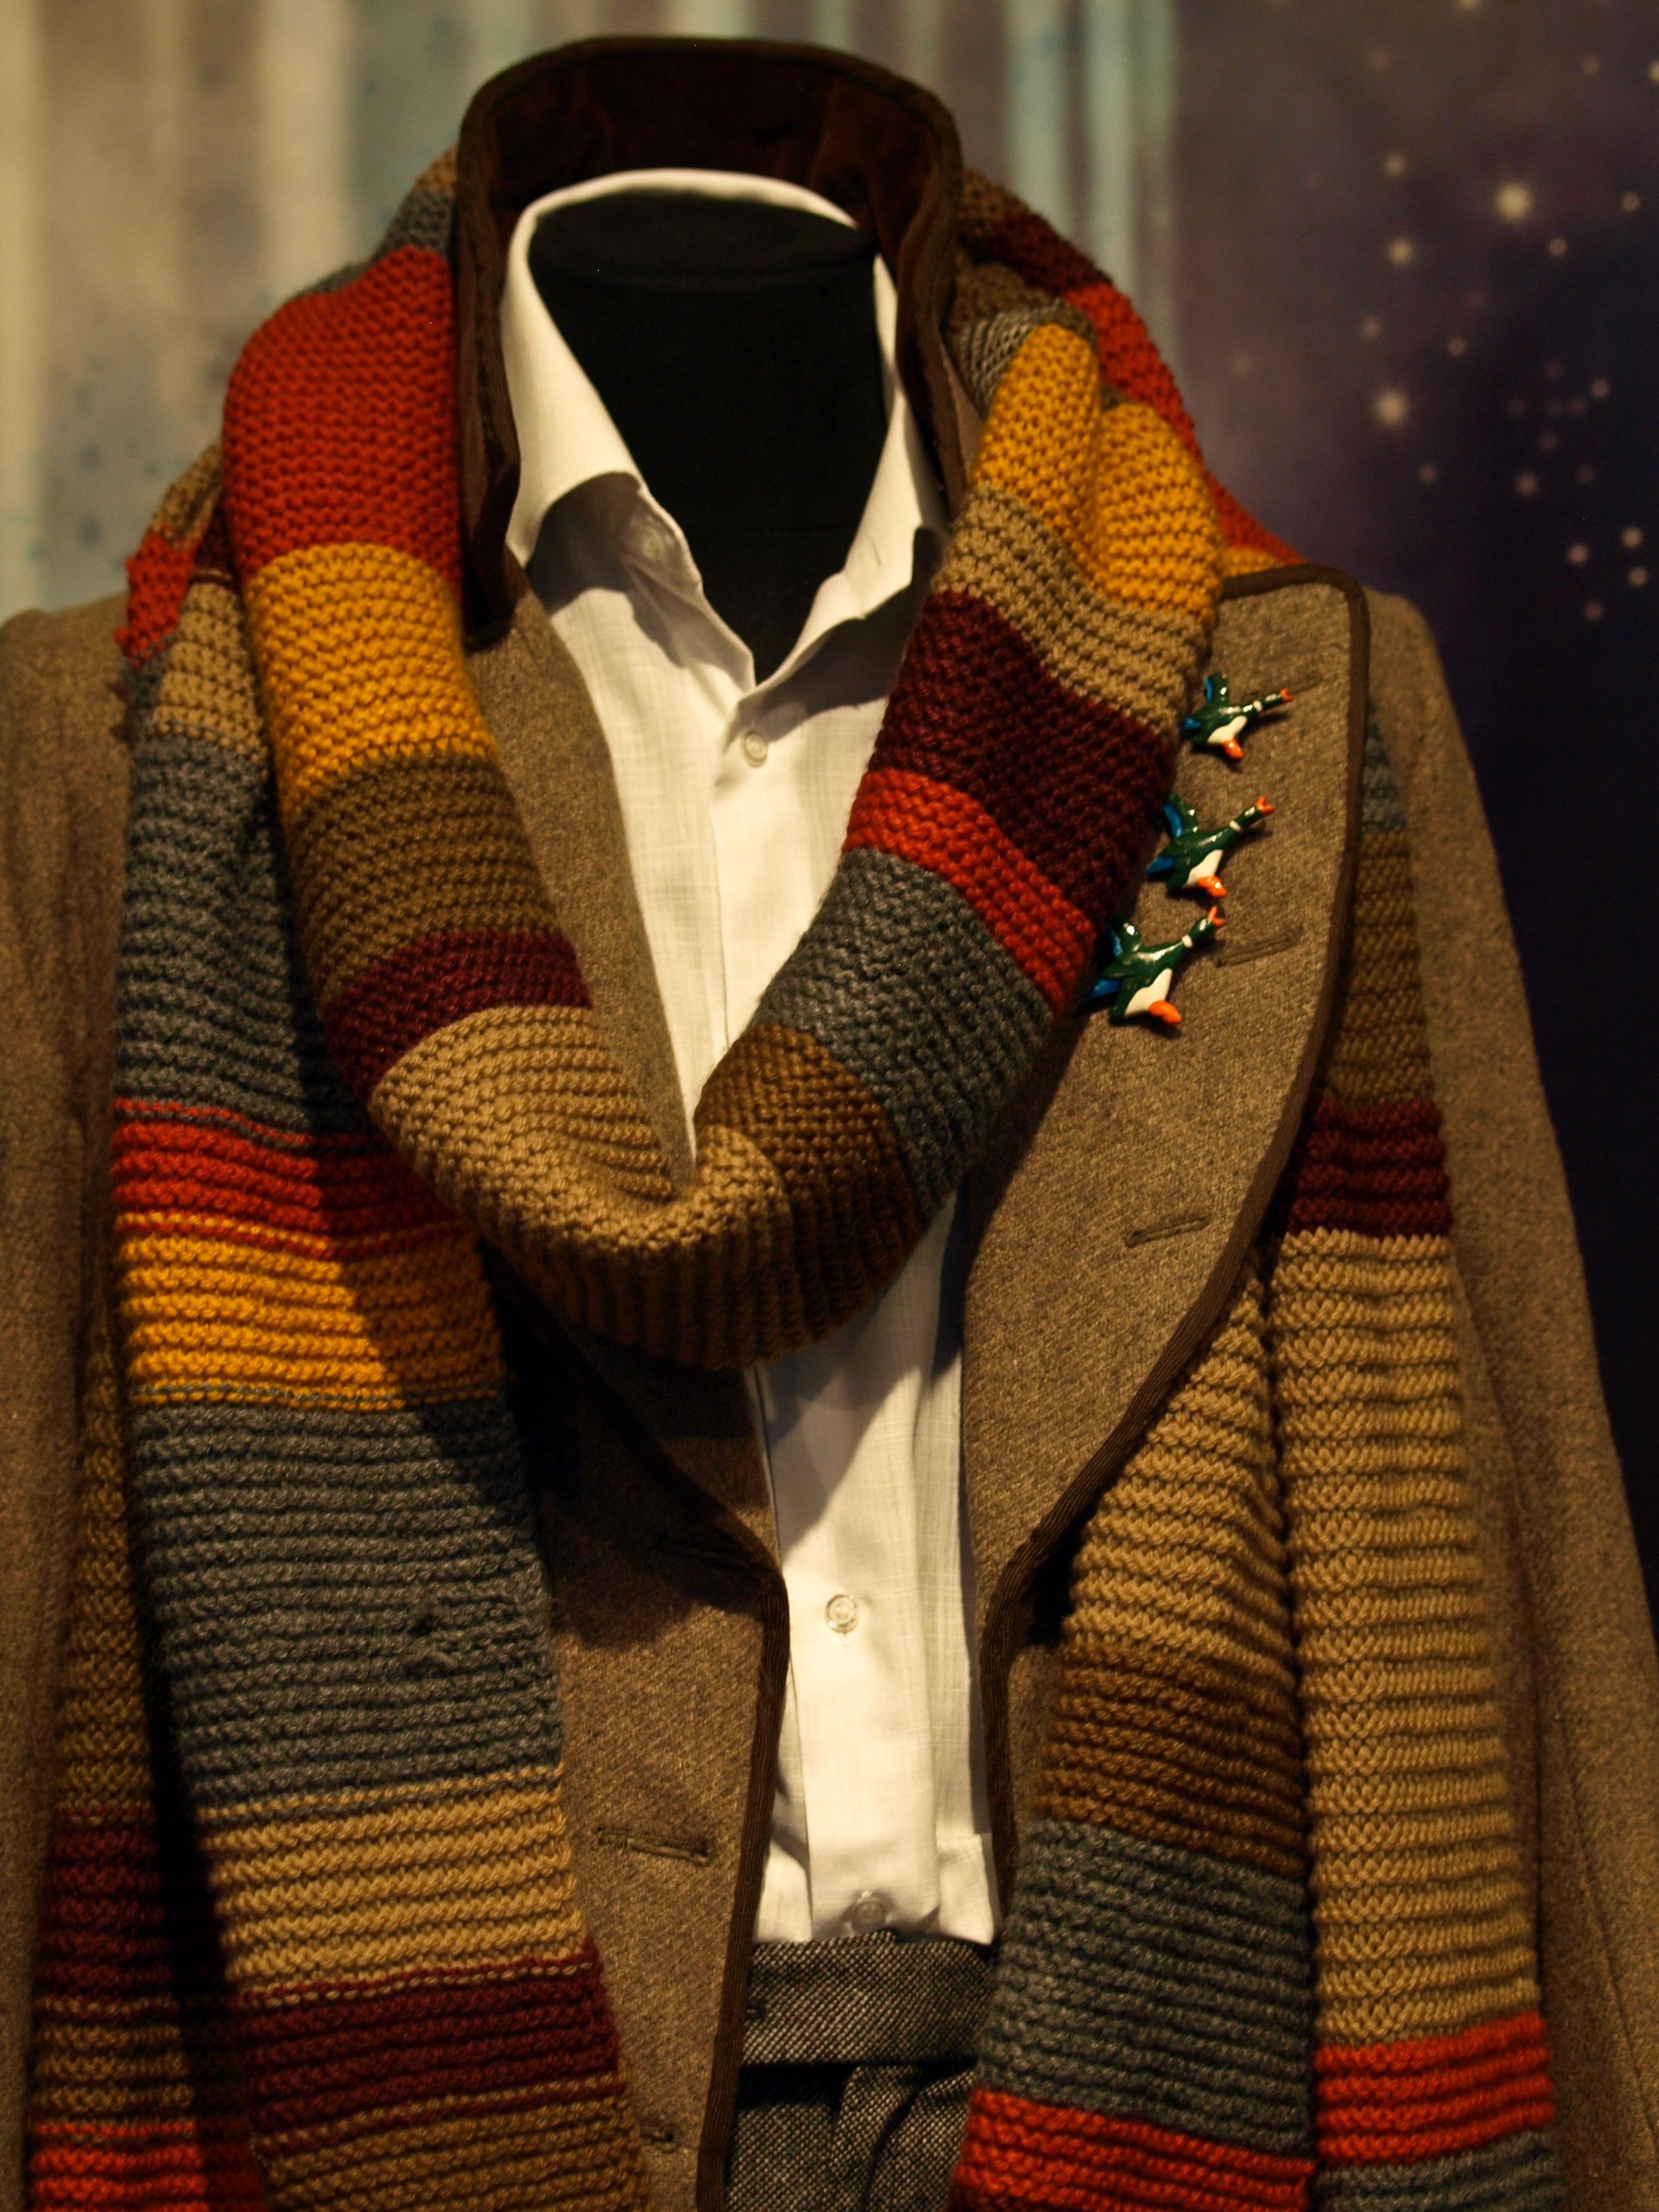 Fourth Doctoru0027s Outfit & Capt Mondou0027s Photo Blog » Blog Archive » Fourth Doctoru0027s Outfit